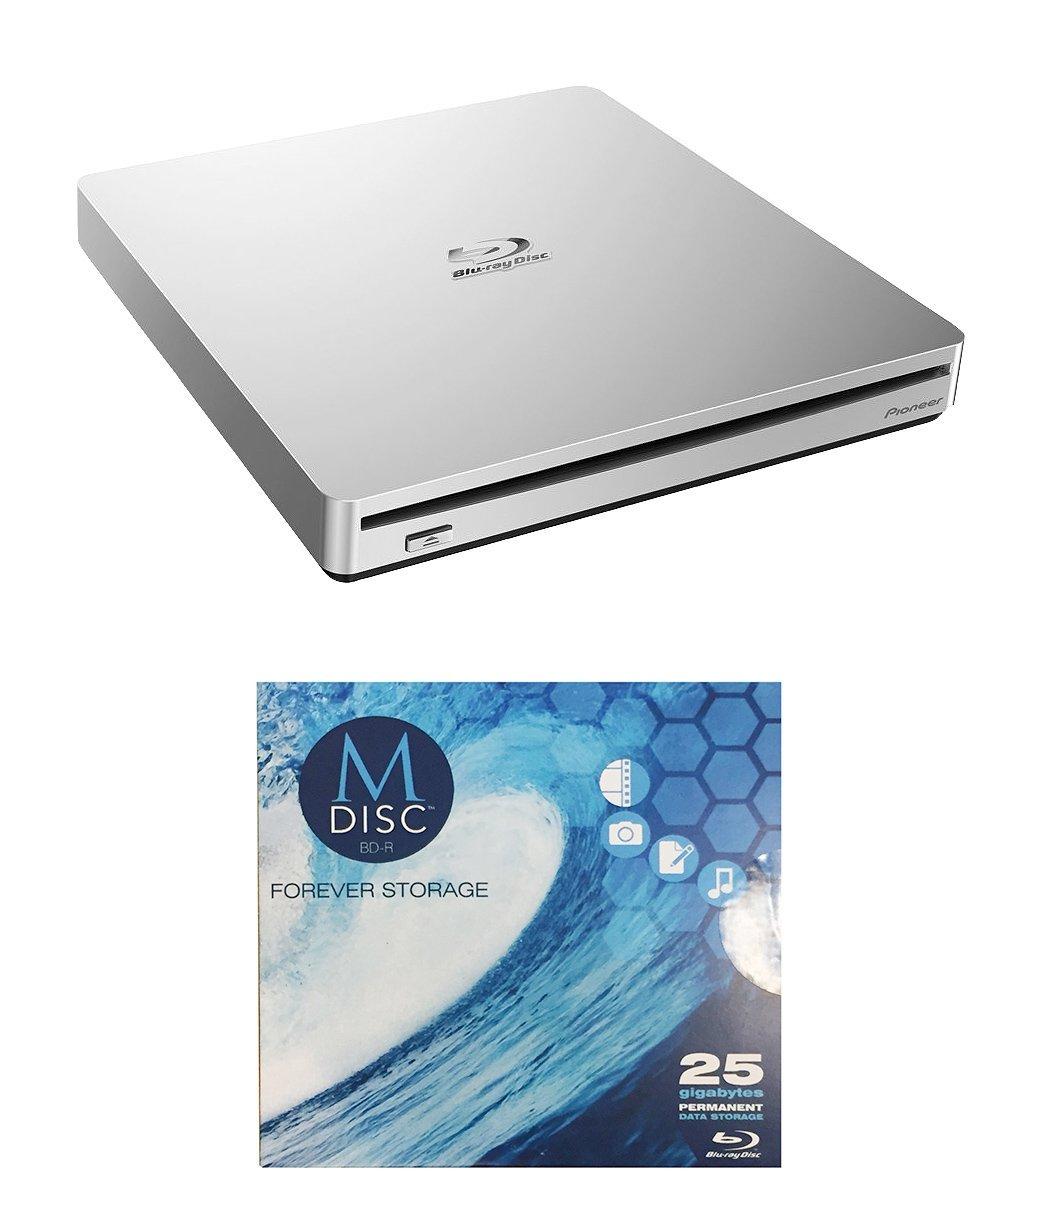 Pioneer 6x BDR-XS06 Slim Portable Blu-ray Burner Bundle with 1 Pack M-DISC BD